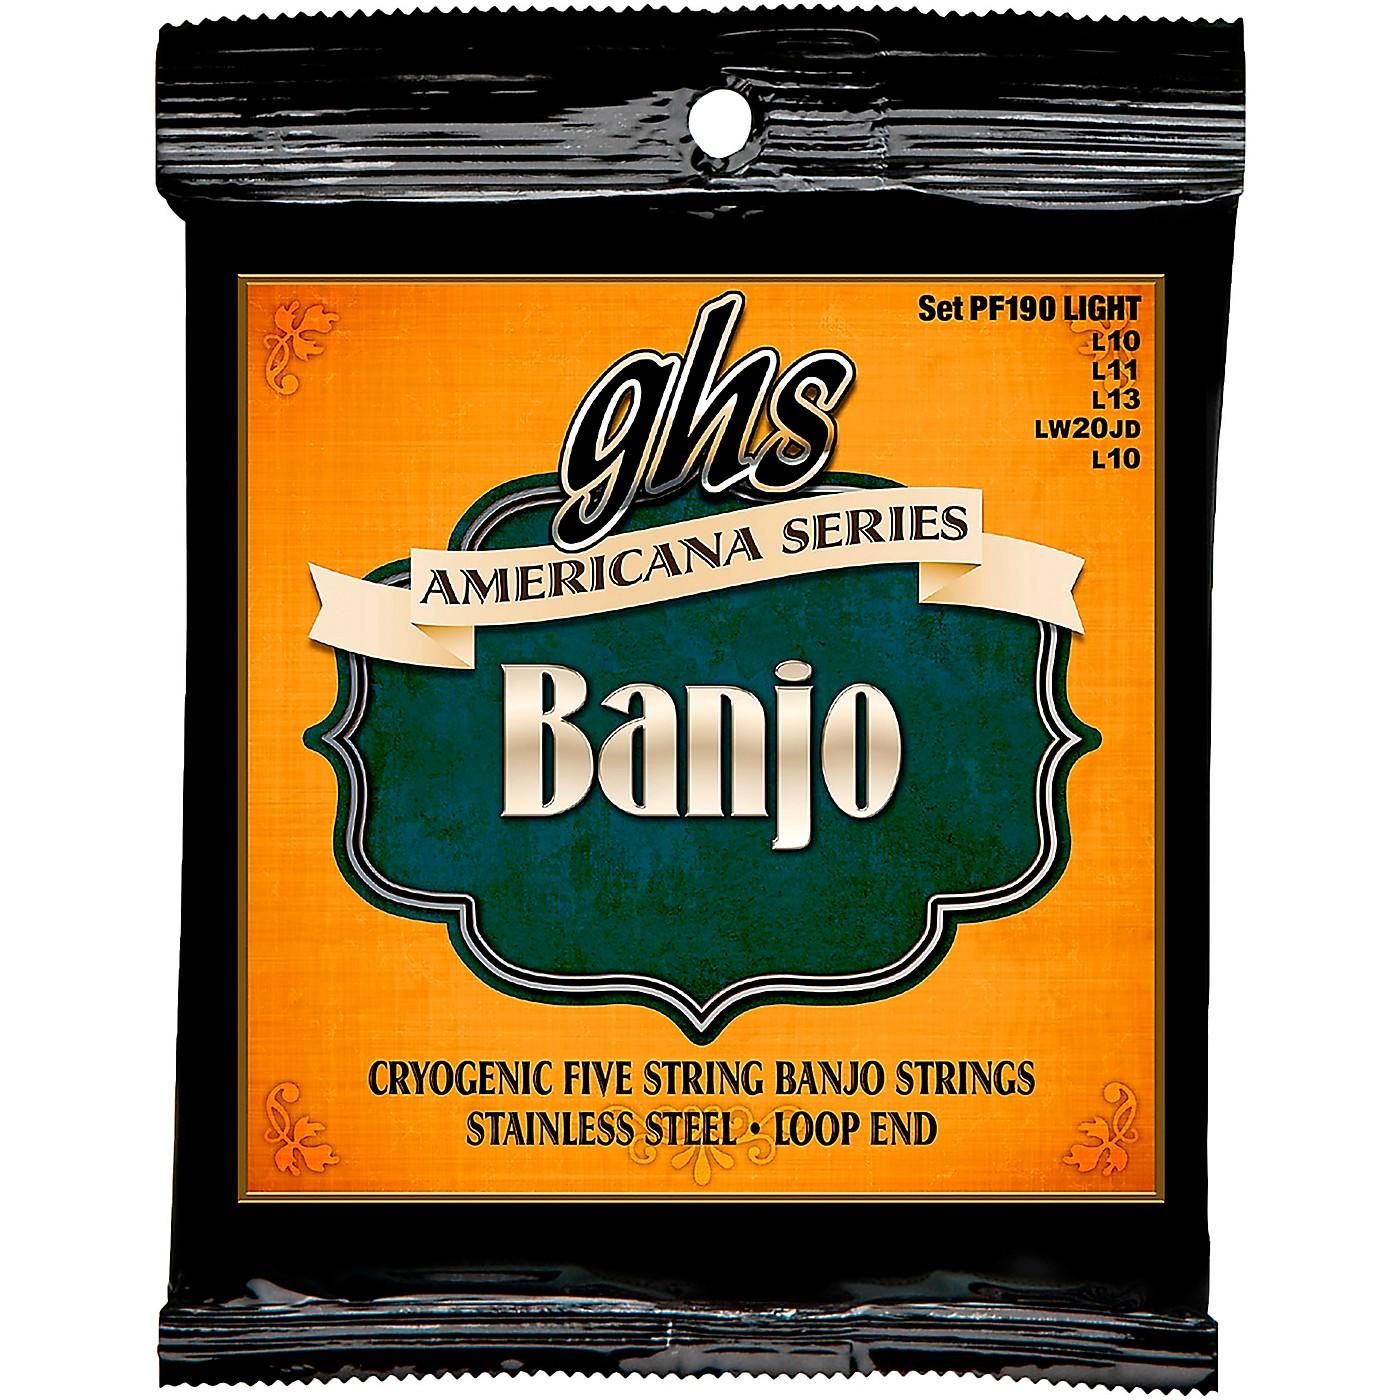 GHS GHS Americana Series Banjo Light Strings (10-LW22JD-10) thumbnail